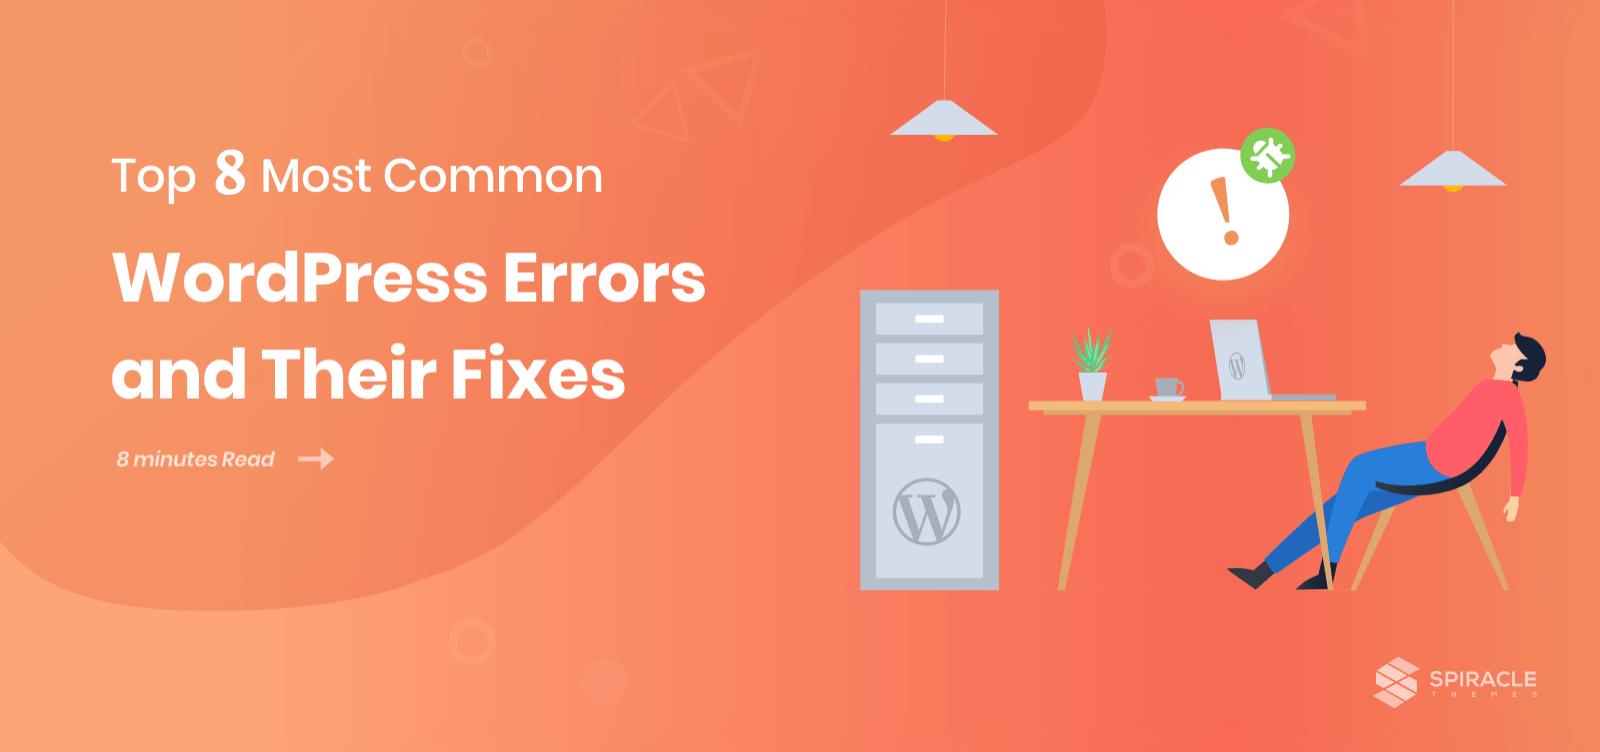 Top 8 Most Common WordPress Errors